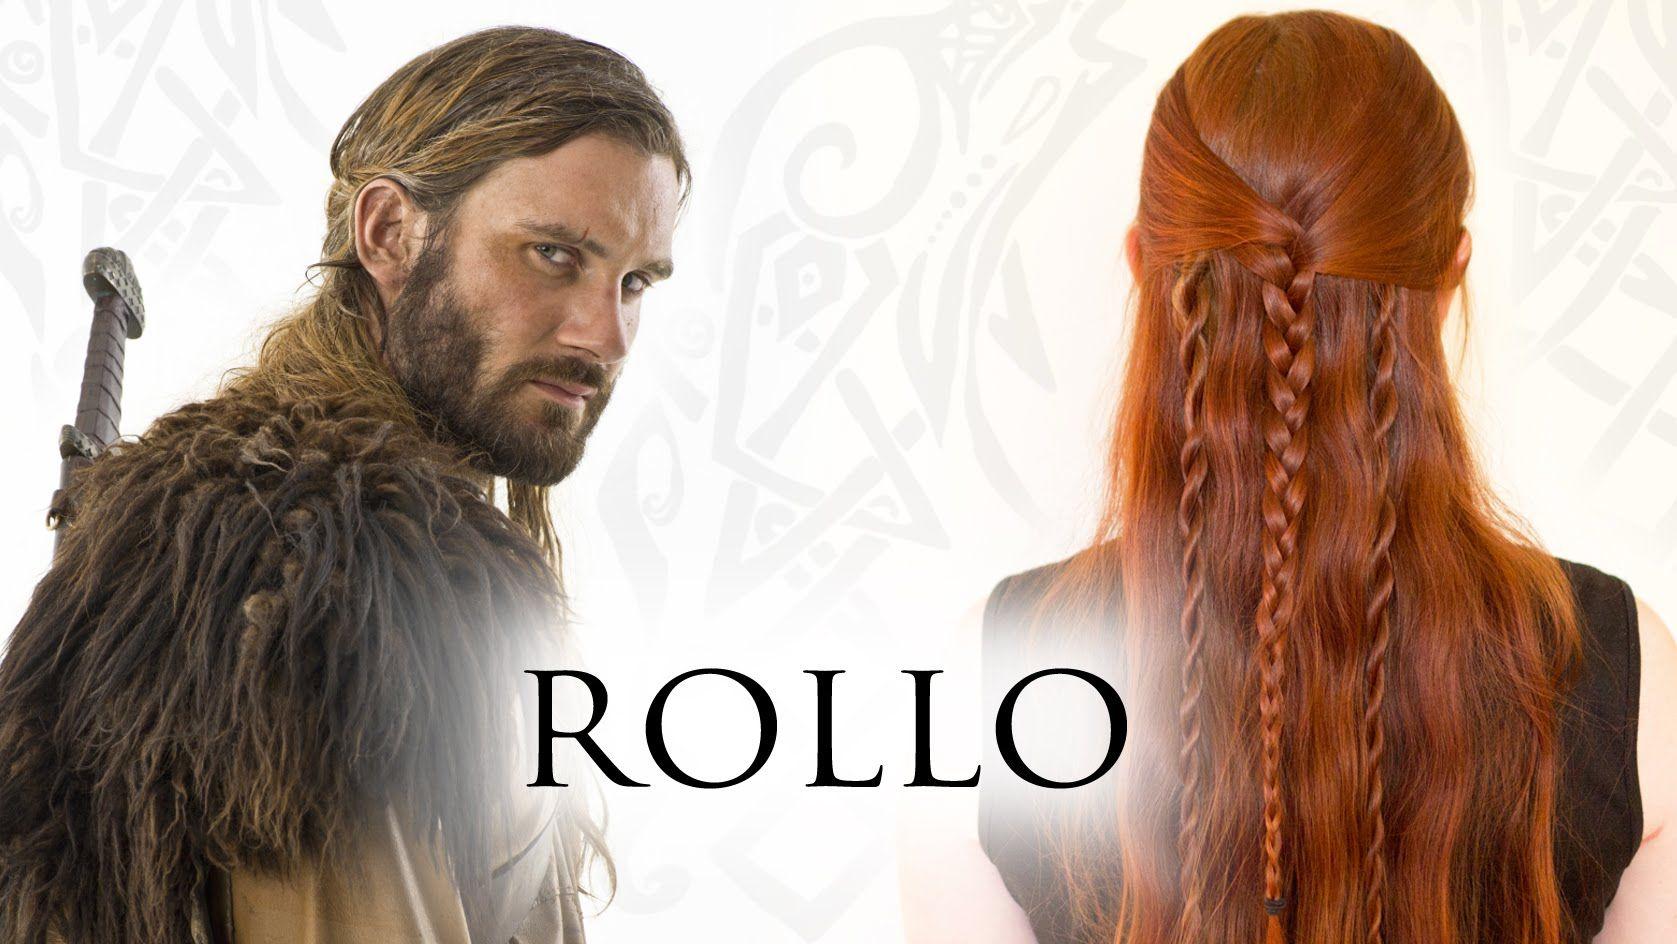 Vikings Hair Tutorial For Men Rollo Lodbrok Lothbrok Viking Hair Hair Tutorial Braided Hairstyles